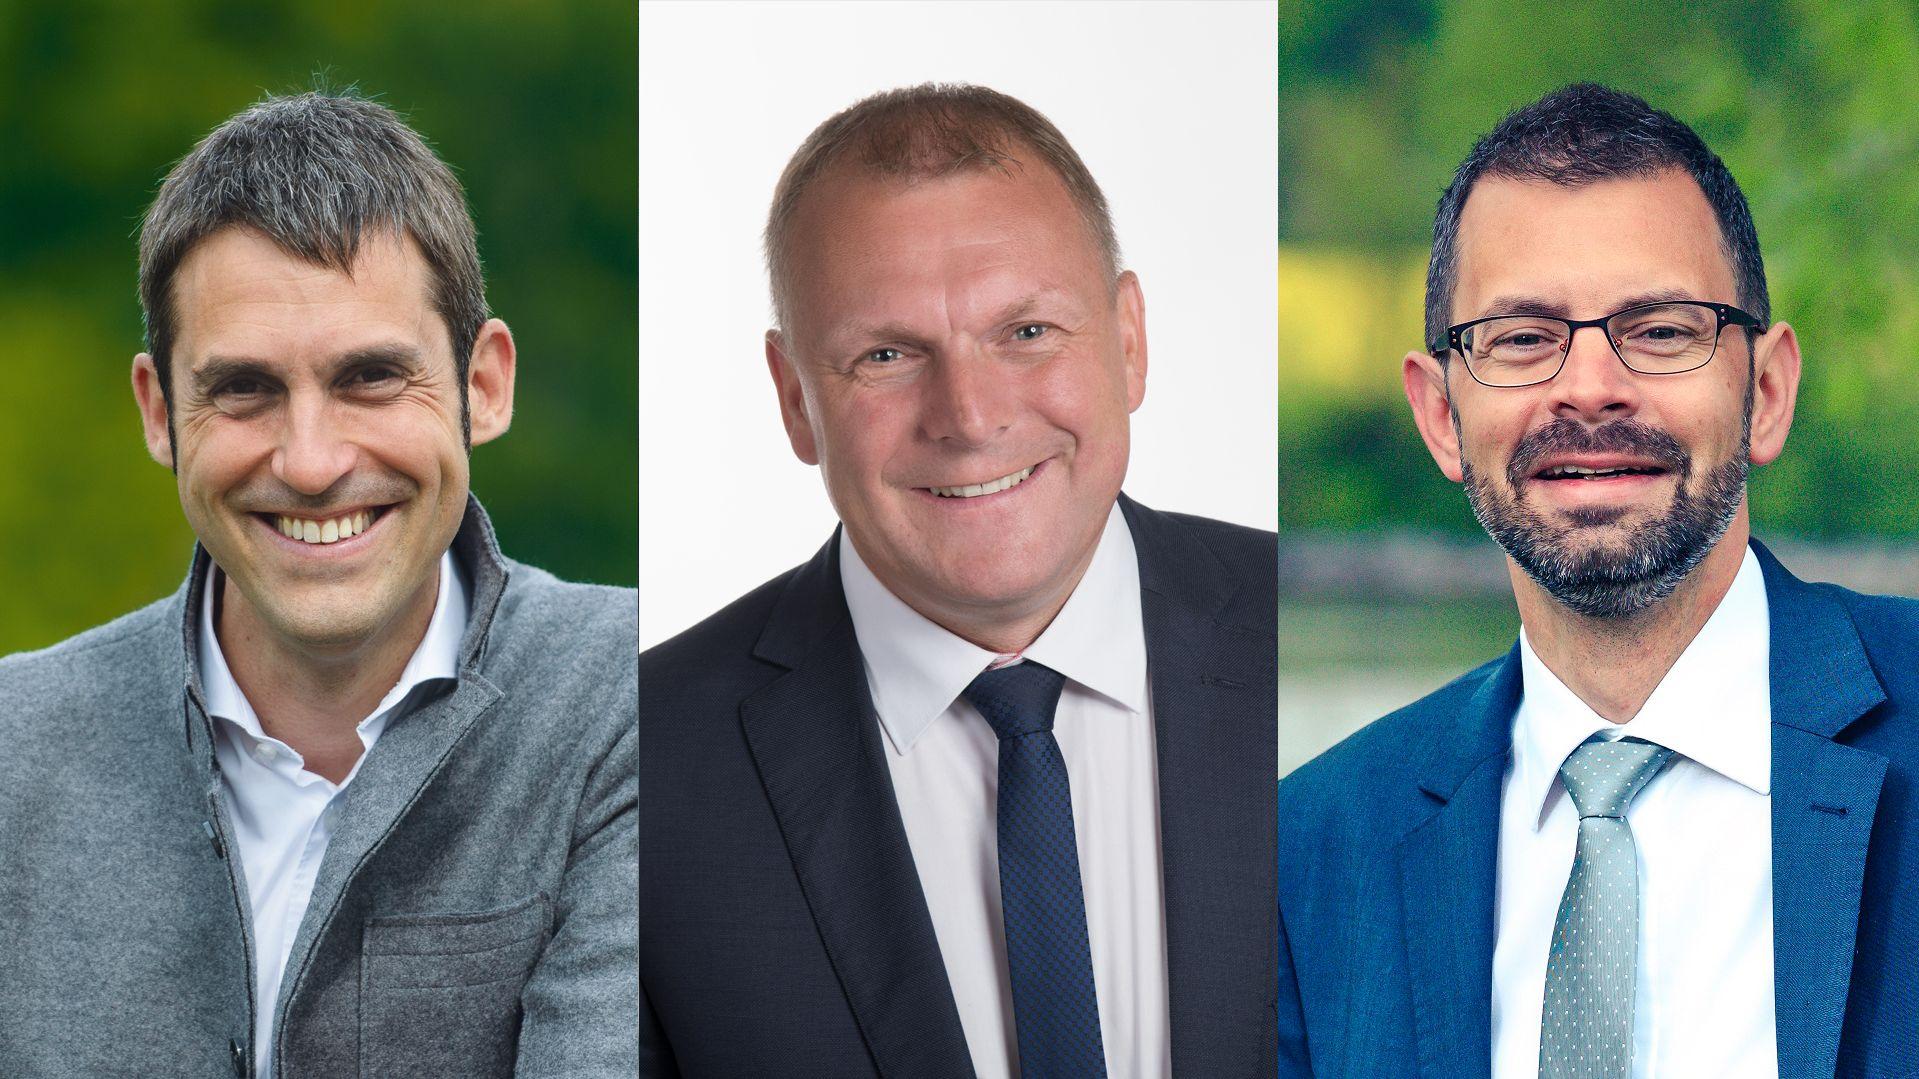 v.l.: Aschaffenburgs Landrat Alexander Legler, Würzburgs Landrat Thomas Eberth, Miltenbergs Landrat Jens Marco Scherf